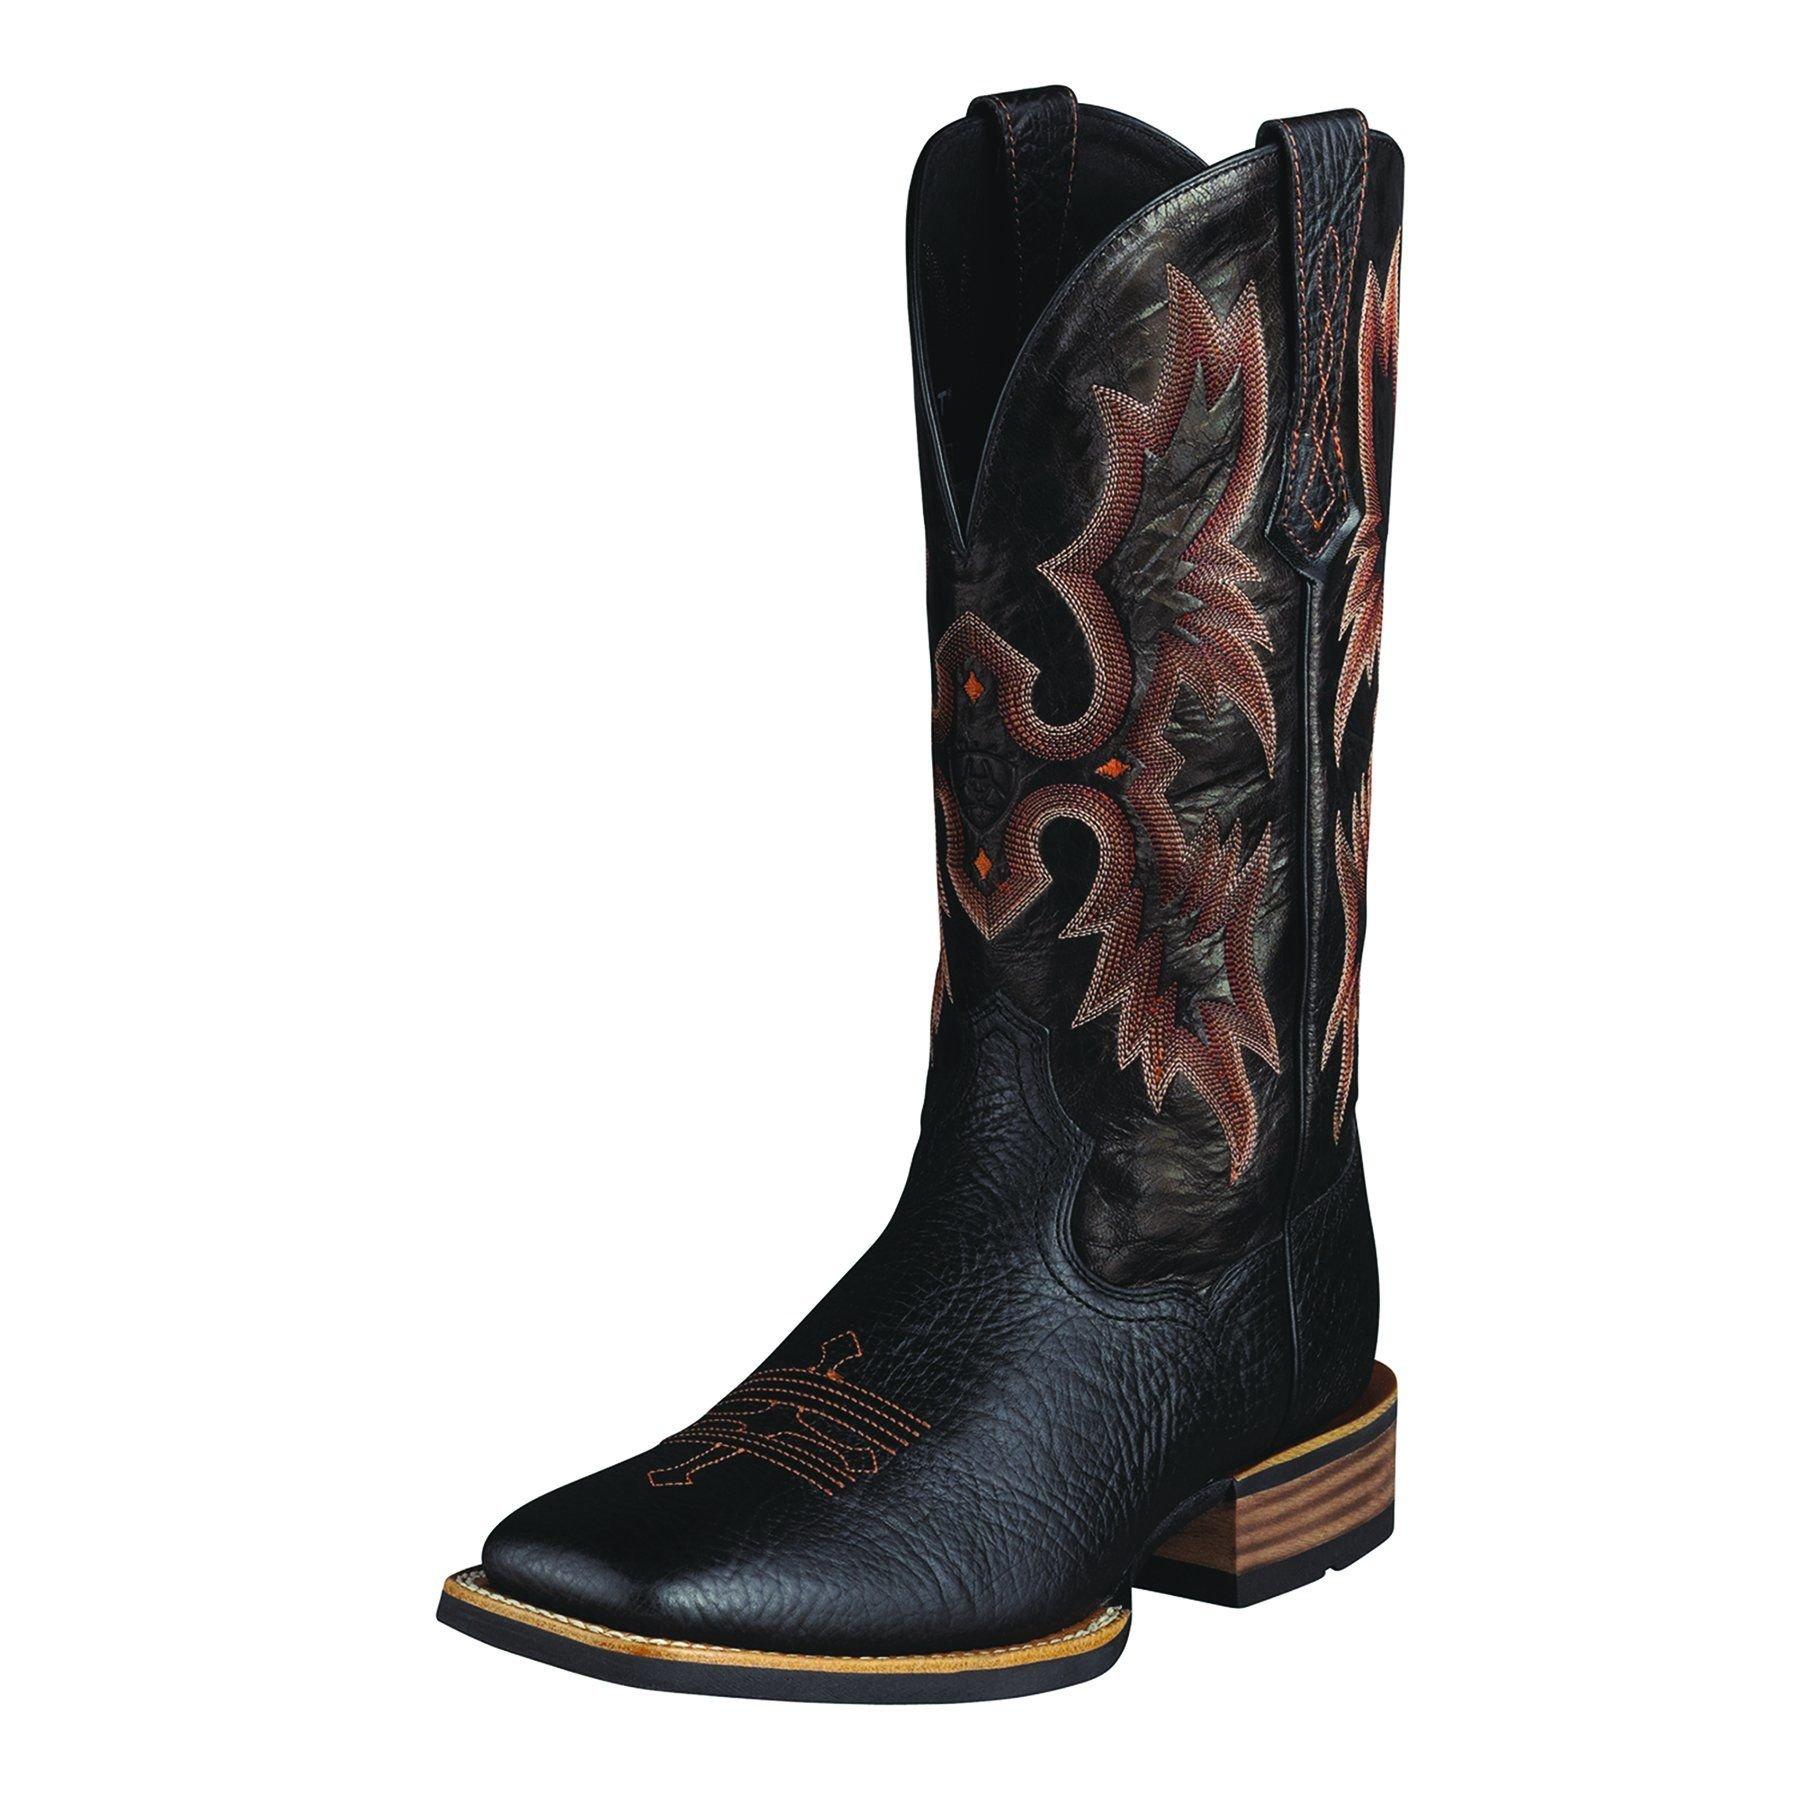 Ariat Men's Tombstone Western Boot, Black/Black, 10.5 D US